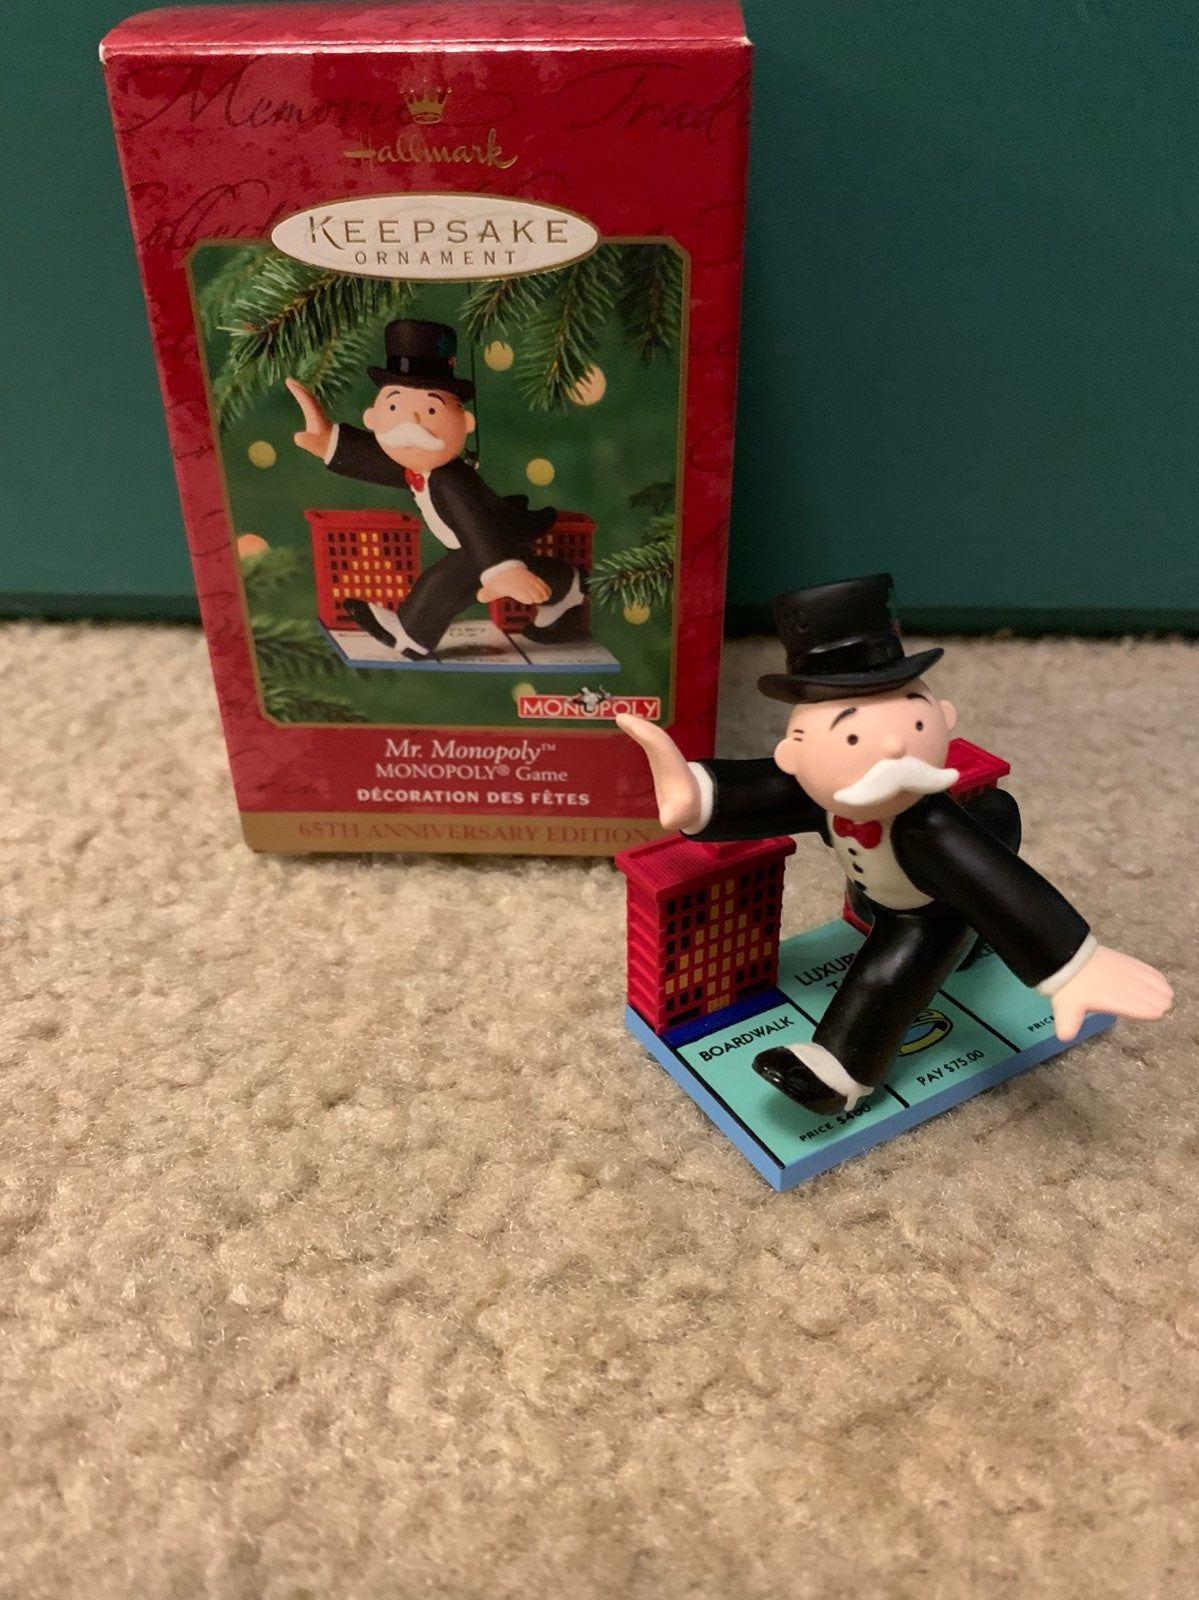 Hallmark keepsake ornament Mr Monopoly 65th Anniversary